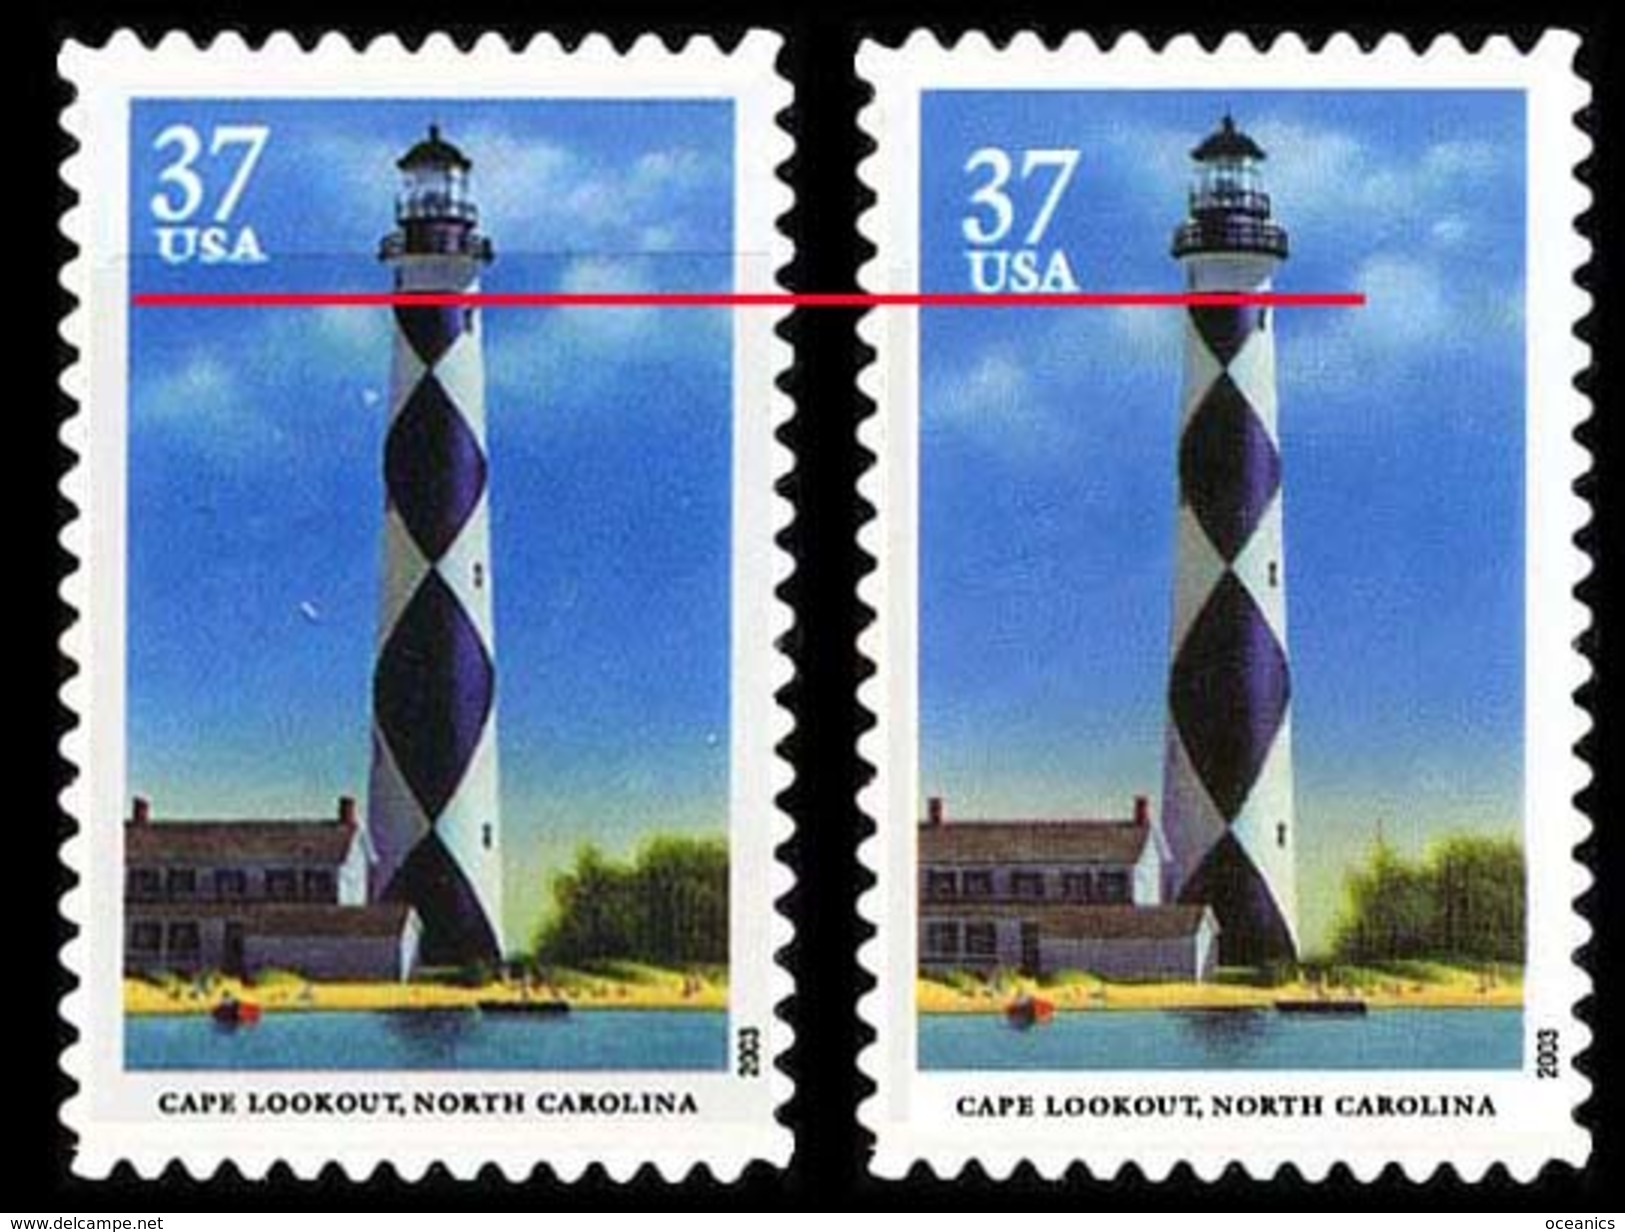 Etats-Unis / United States (Scott No.3791 - Southeastern Lighthousese)+ [**] NOTE - Unused Stamps